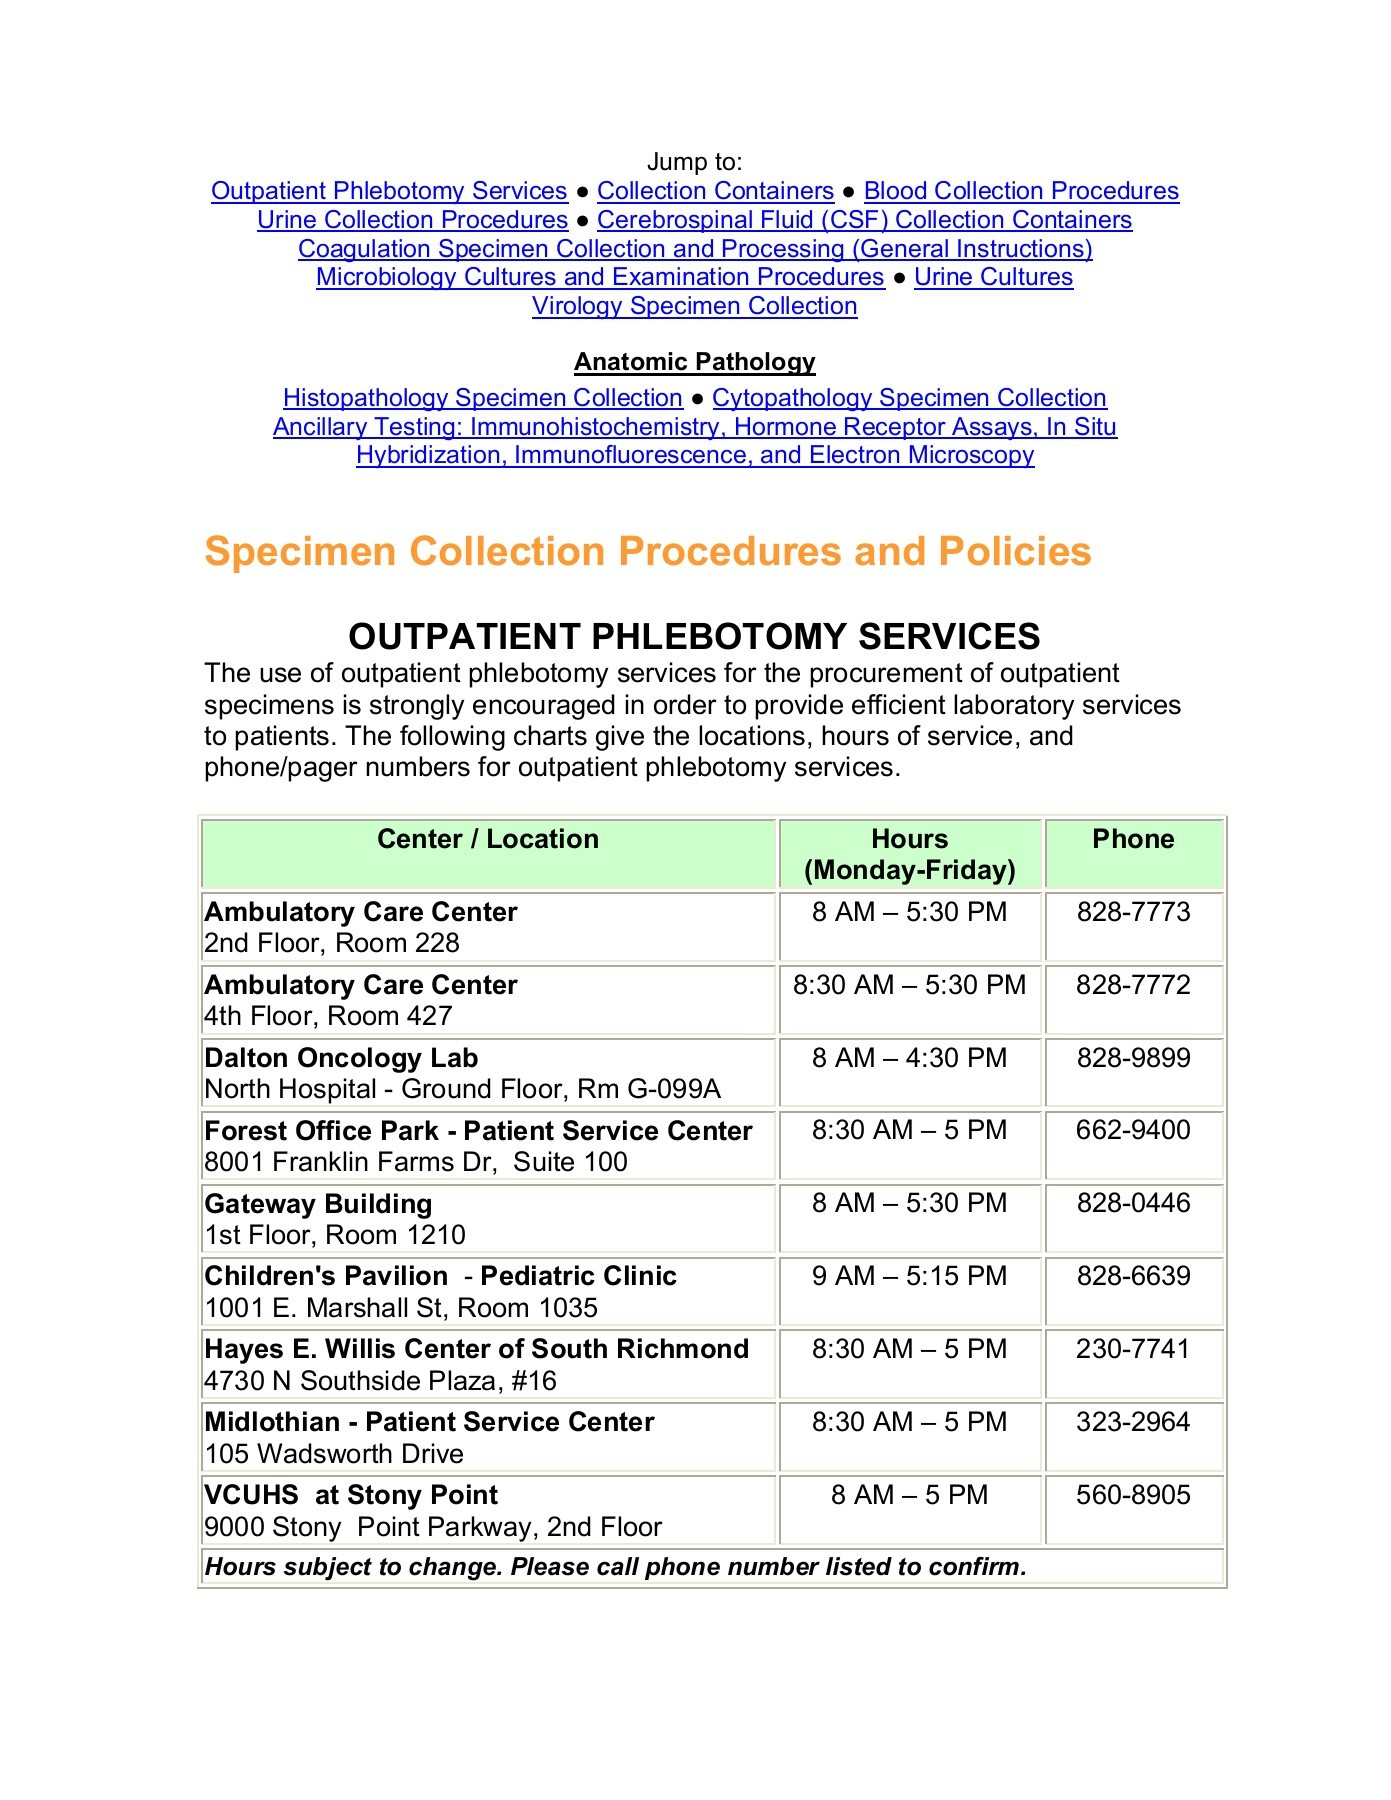 specimen collection procedures and policies fliphtml5